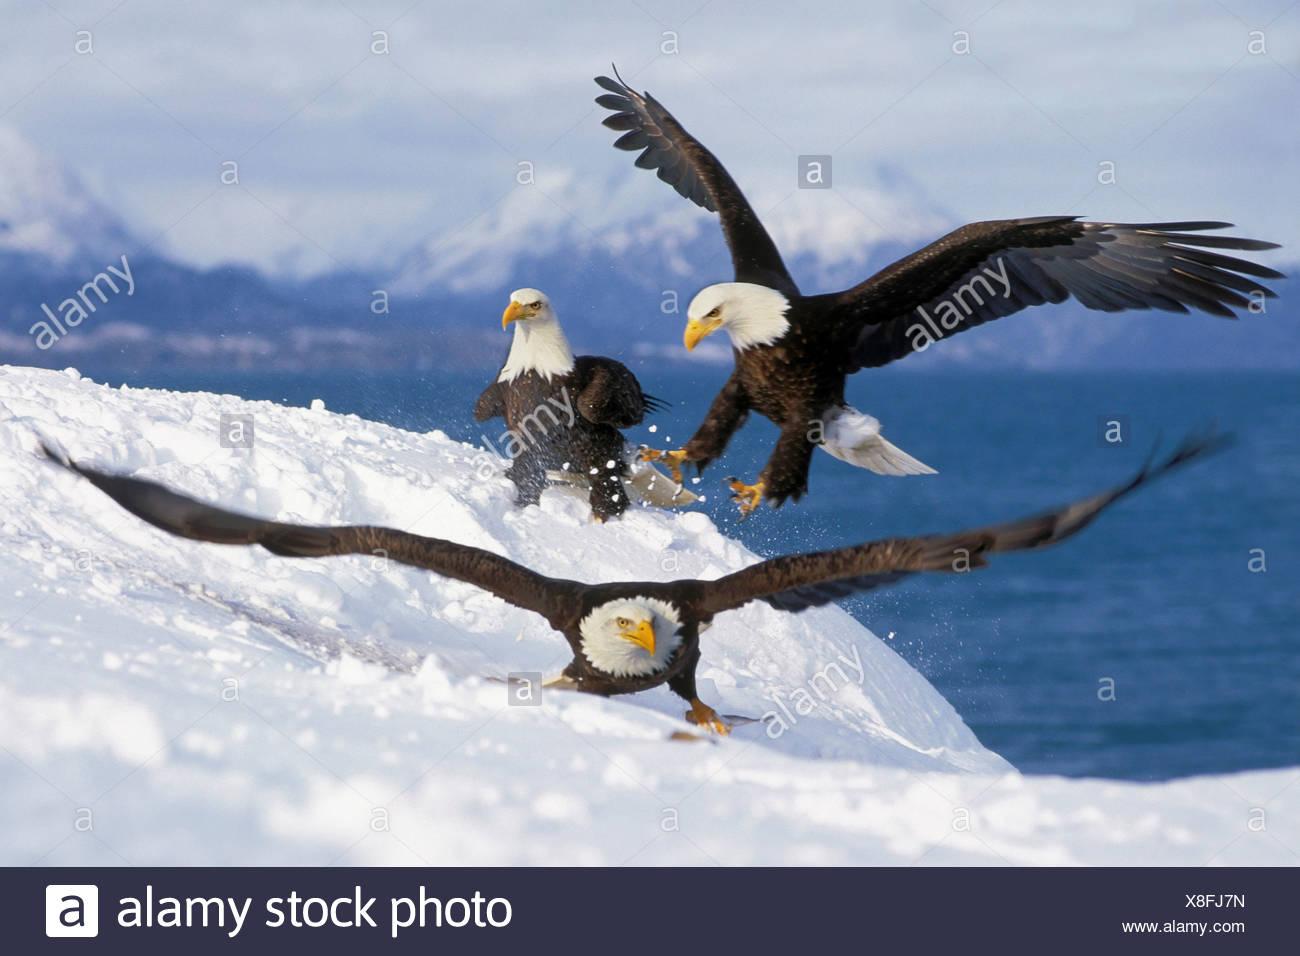 Bald eagles competing for fish, Homer, Alaska - Stock Image